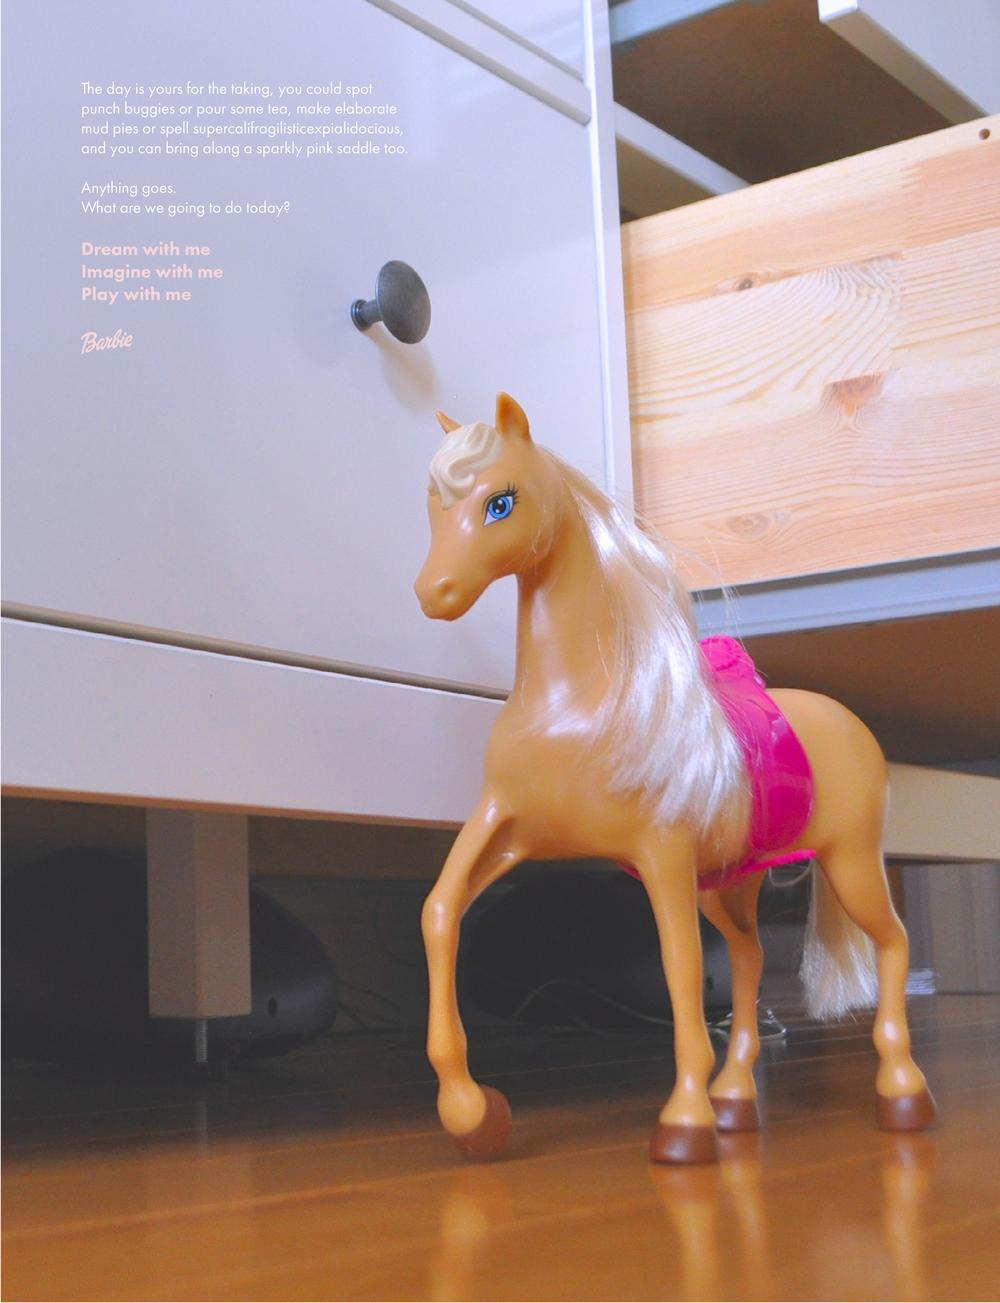 Barbe+Print+Ad+(Pink)33.png